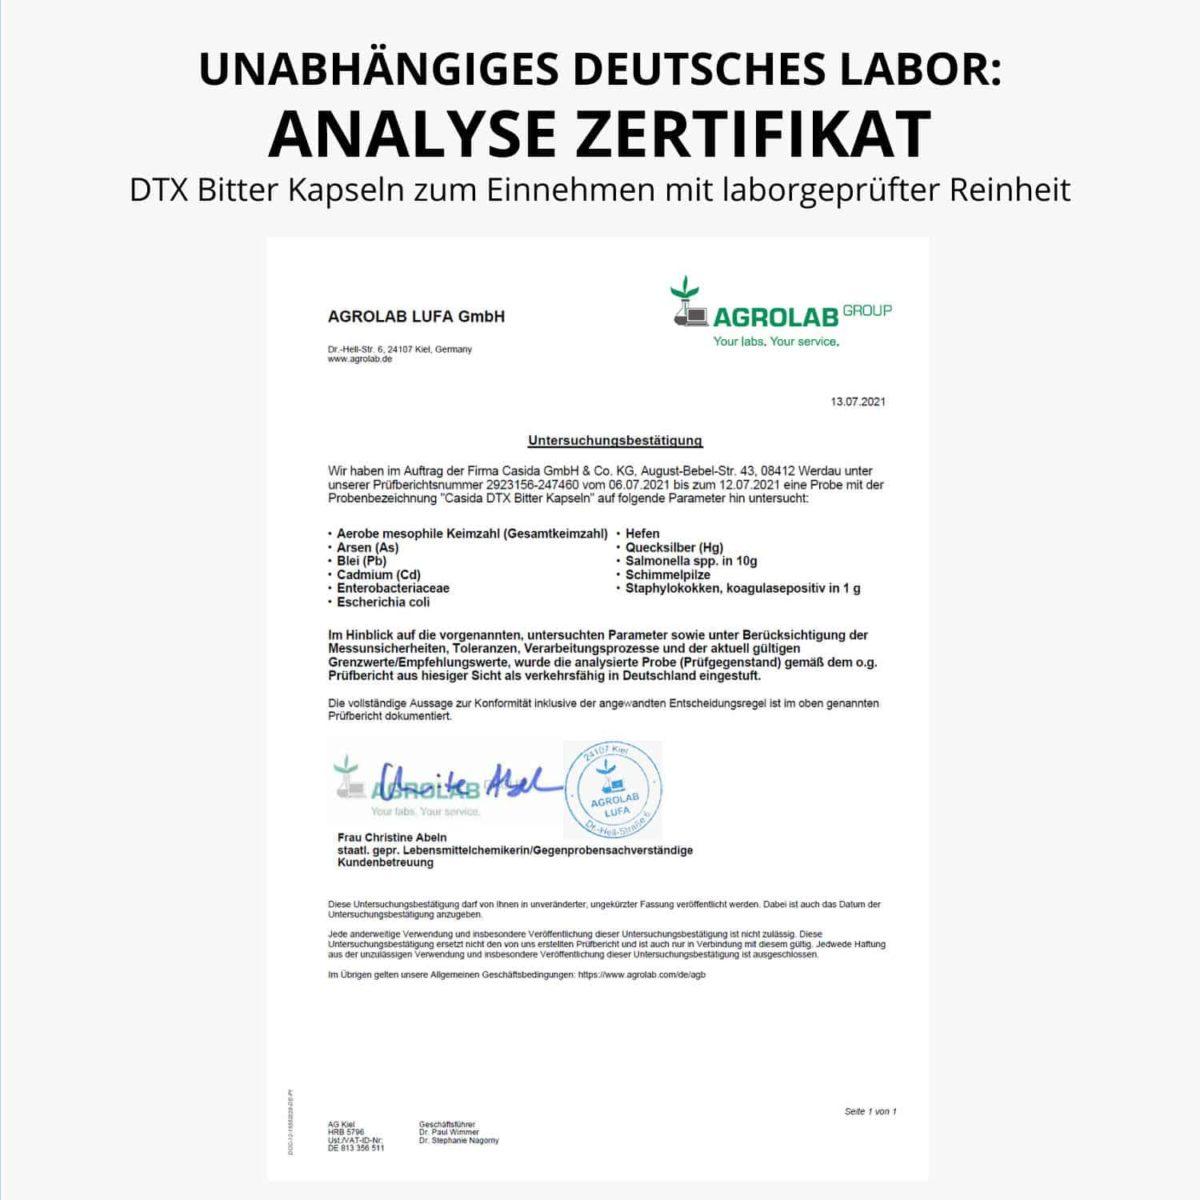 Casida DTX Bitter Kapseln 60 Stück PZN 17175086 Agrolab Zertifikat